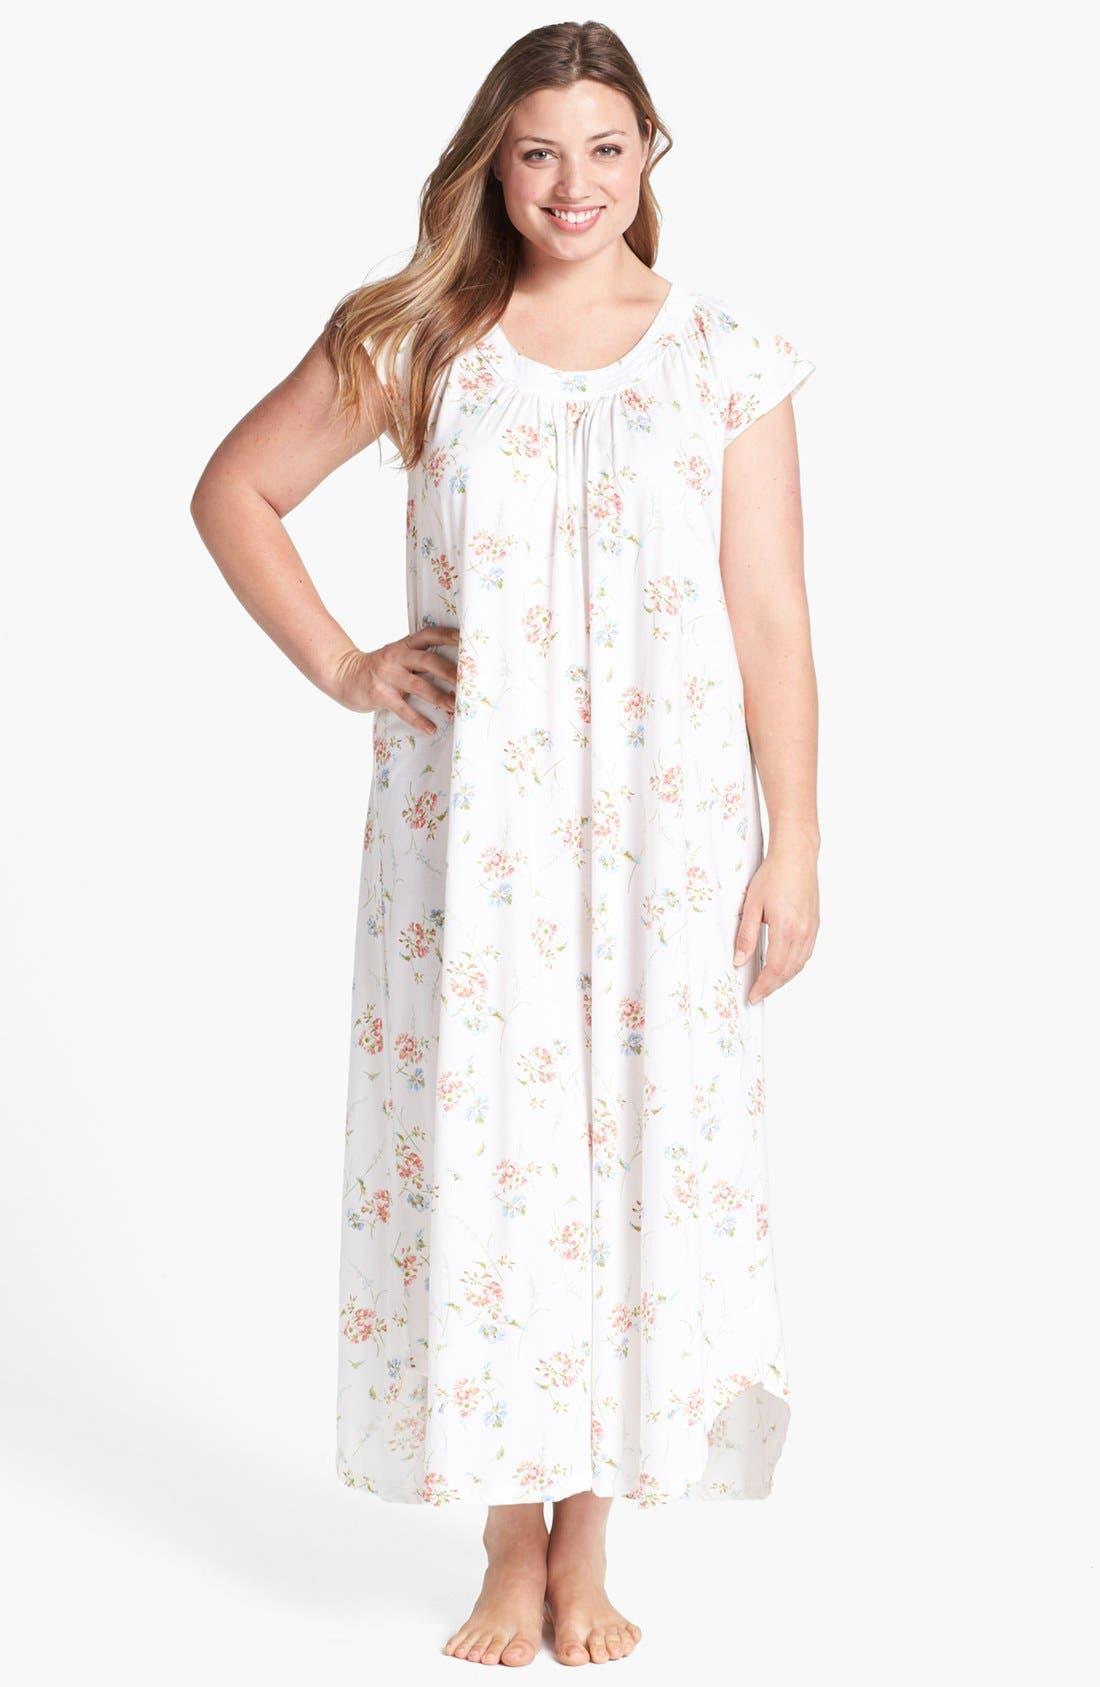 Alternate Image 1 Selected - Carole Hochman Designs 'Garden Delights' Nightgown (Plus Size)